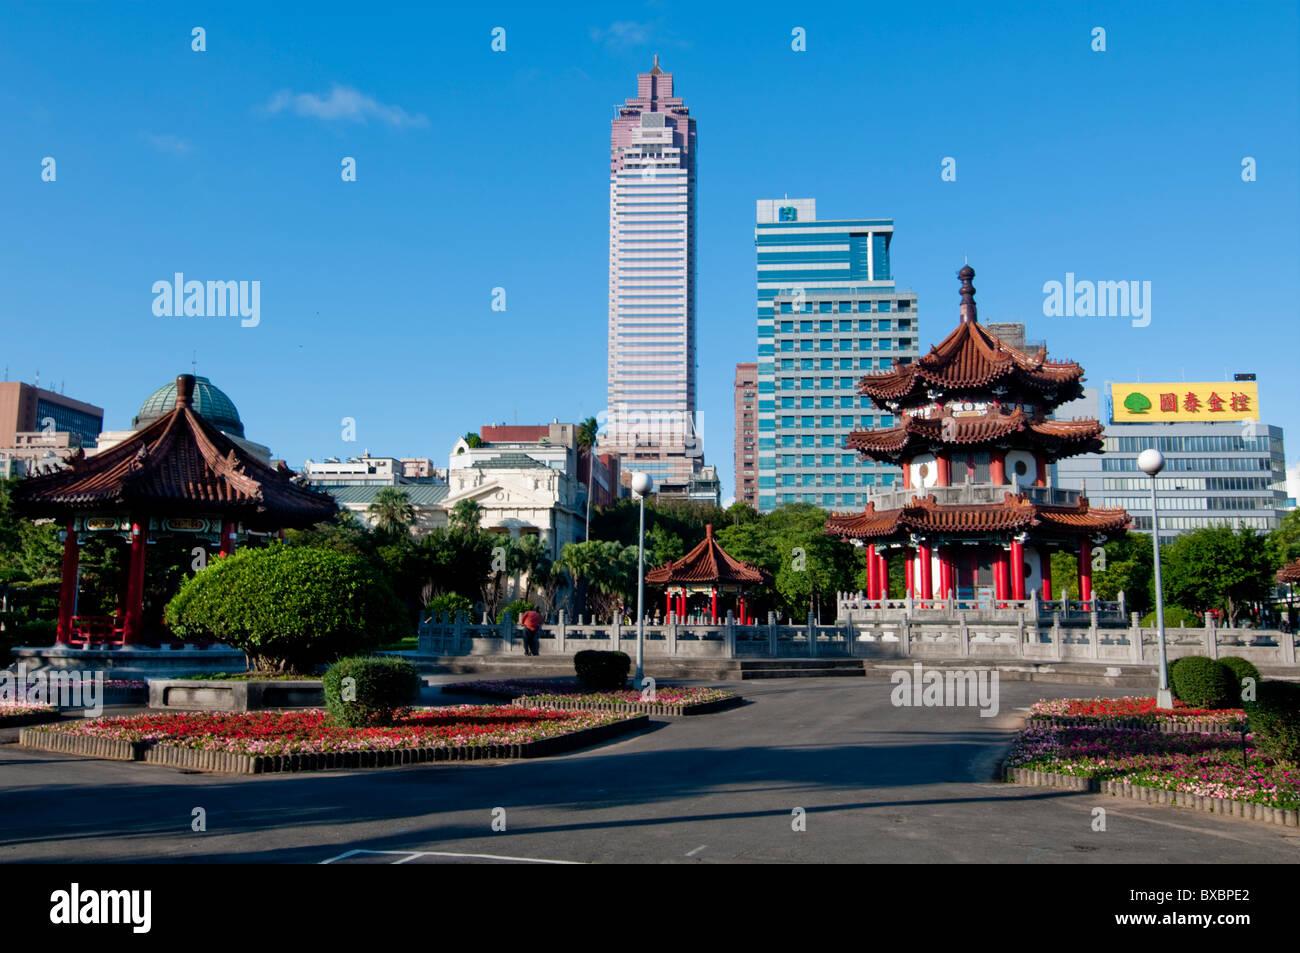 Asia, Taiwan, Taipei City Park pagoda Immagini Stock